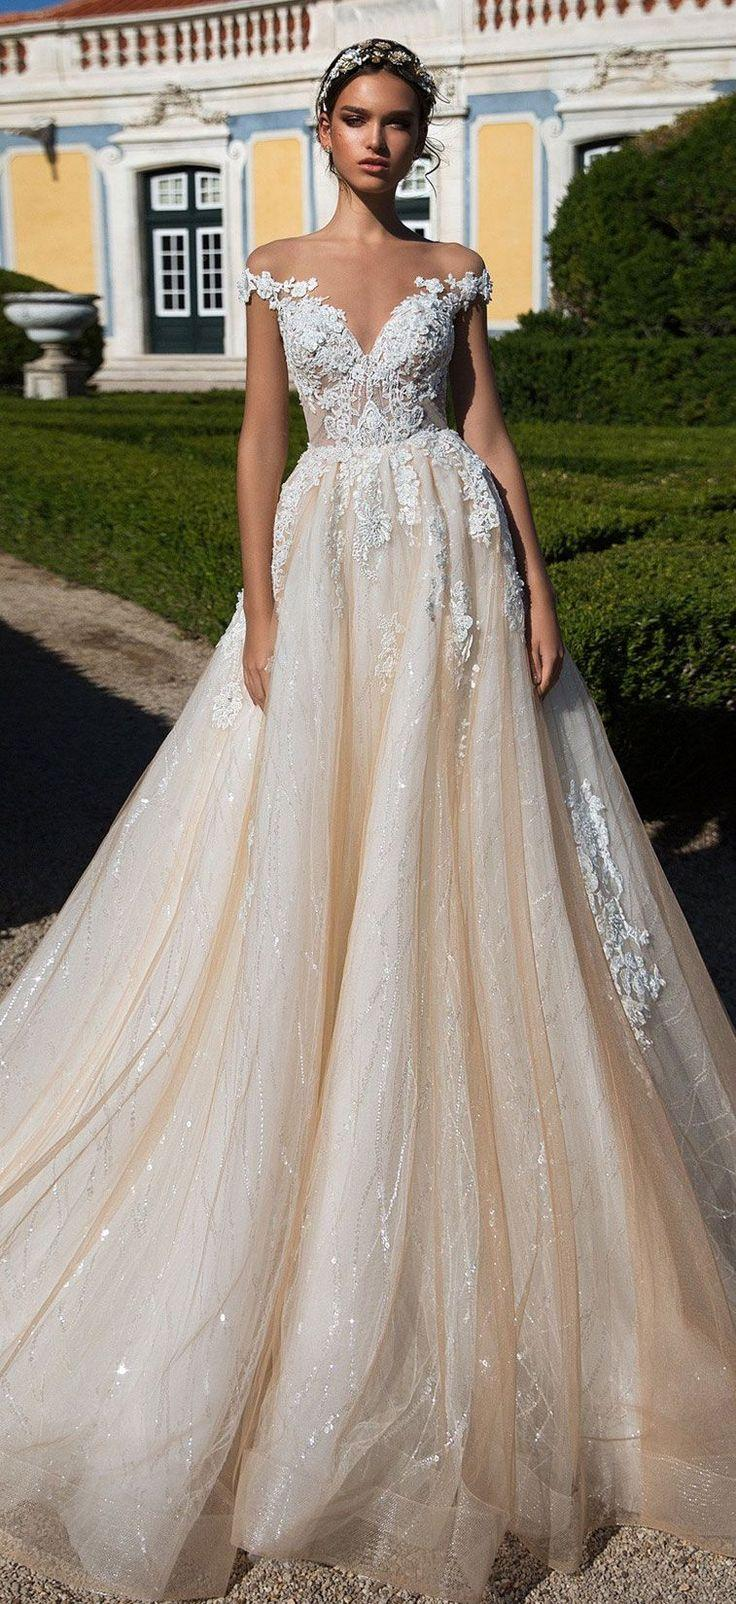 4efccc65b8d Dress - Milla Nova Wedding Dress Inspiration  2825346 - Weddbook